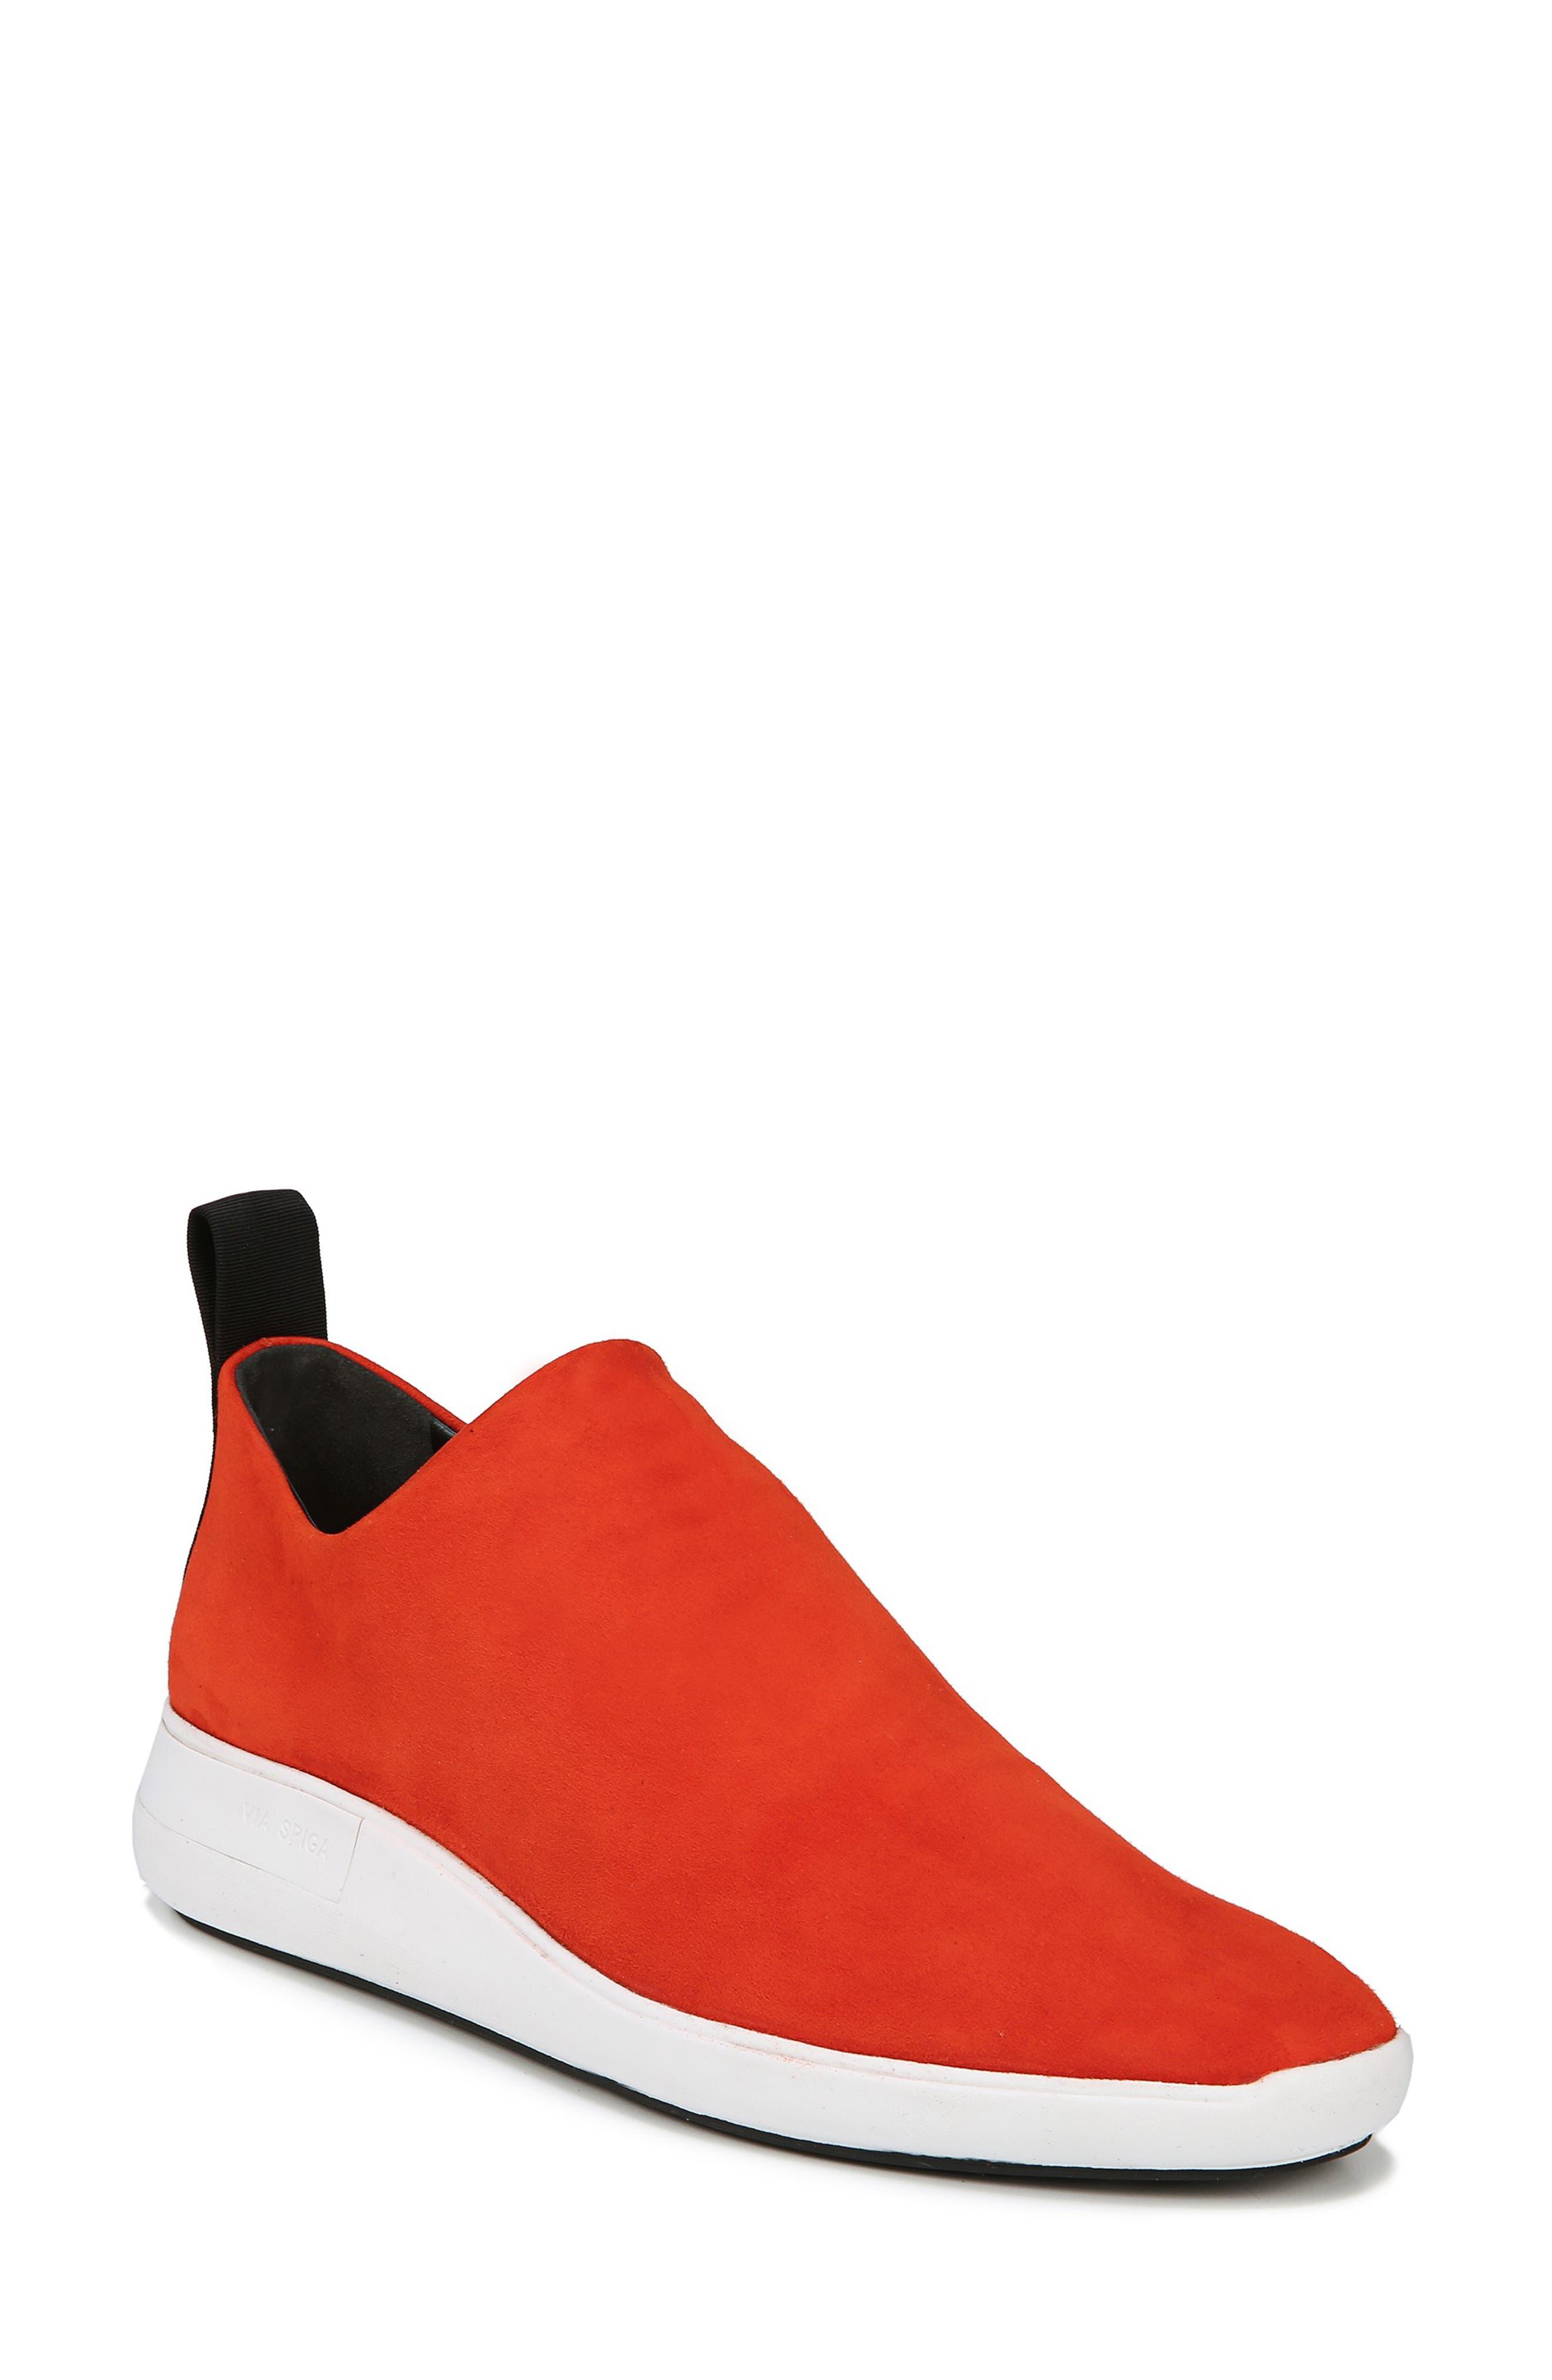 Marlow Slip-On Sneaker,                             Main thumbnail 1, color,                             SIENNA